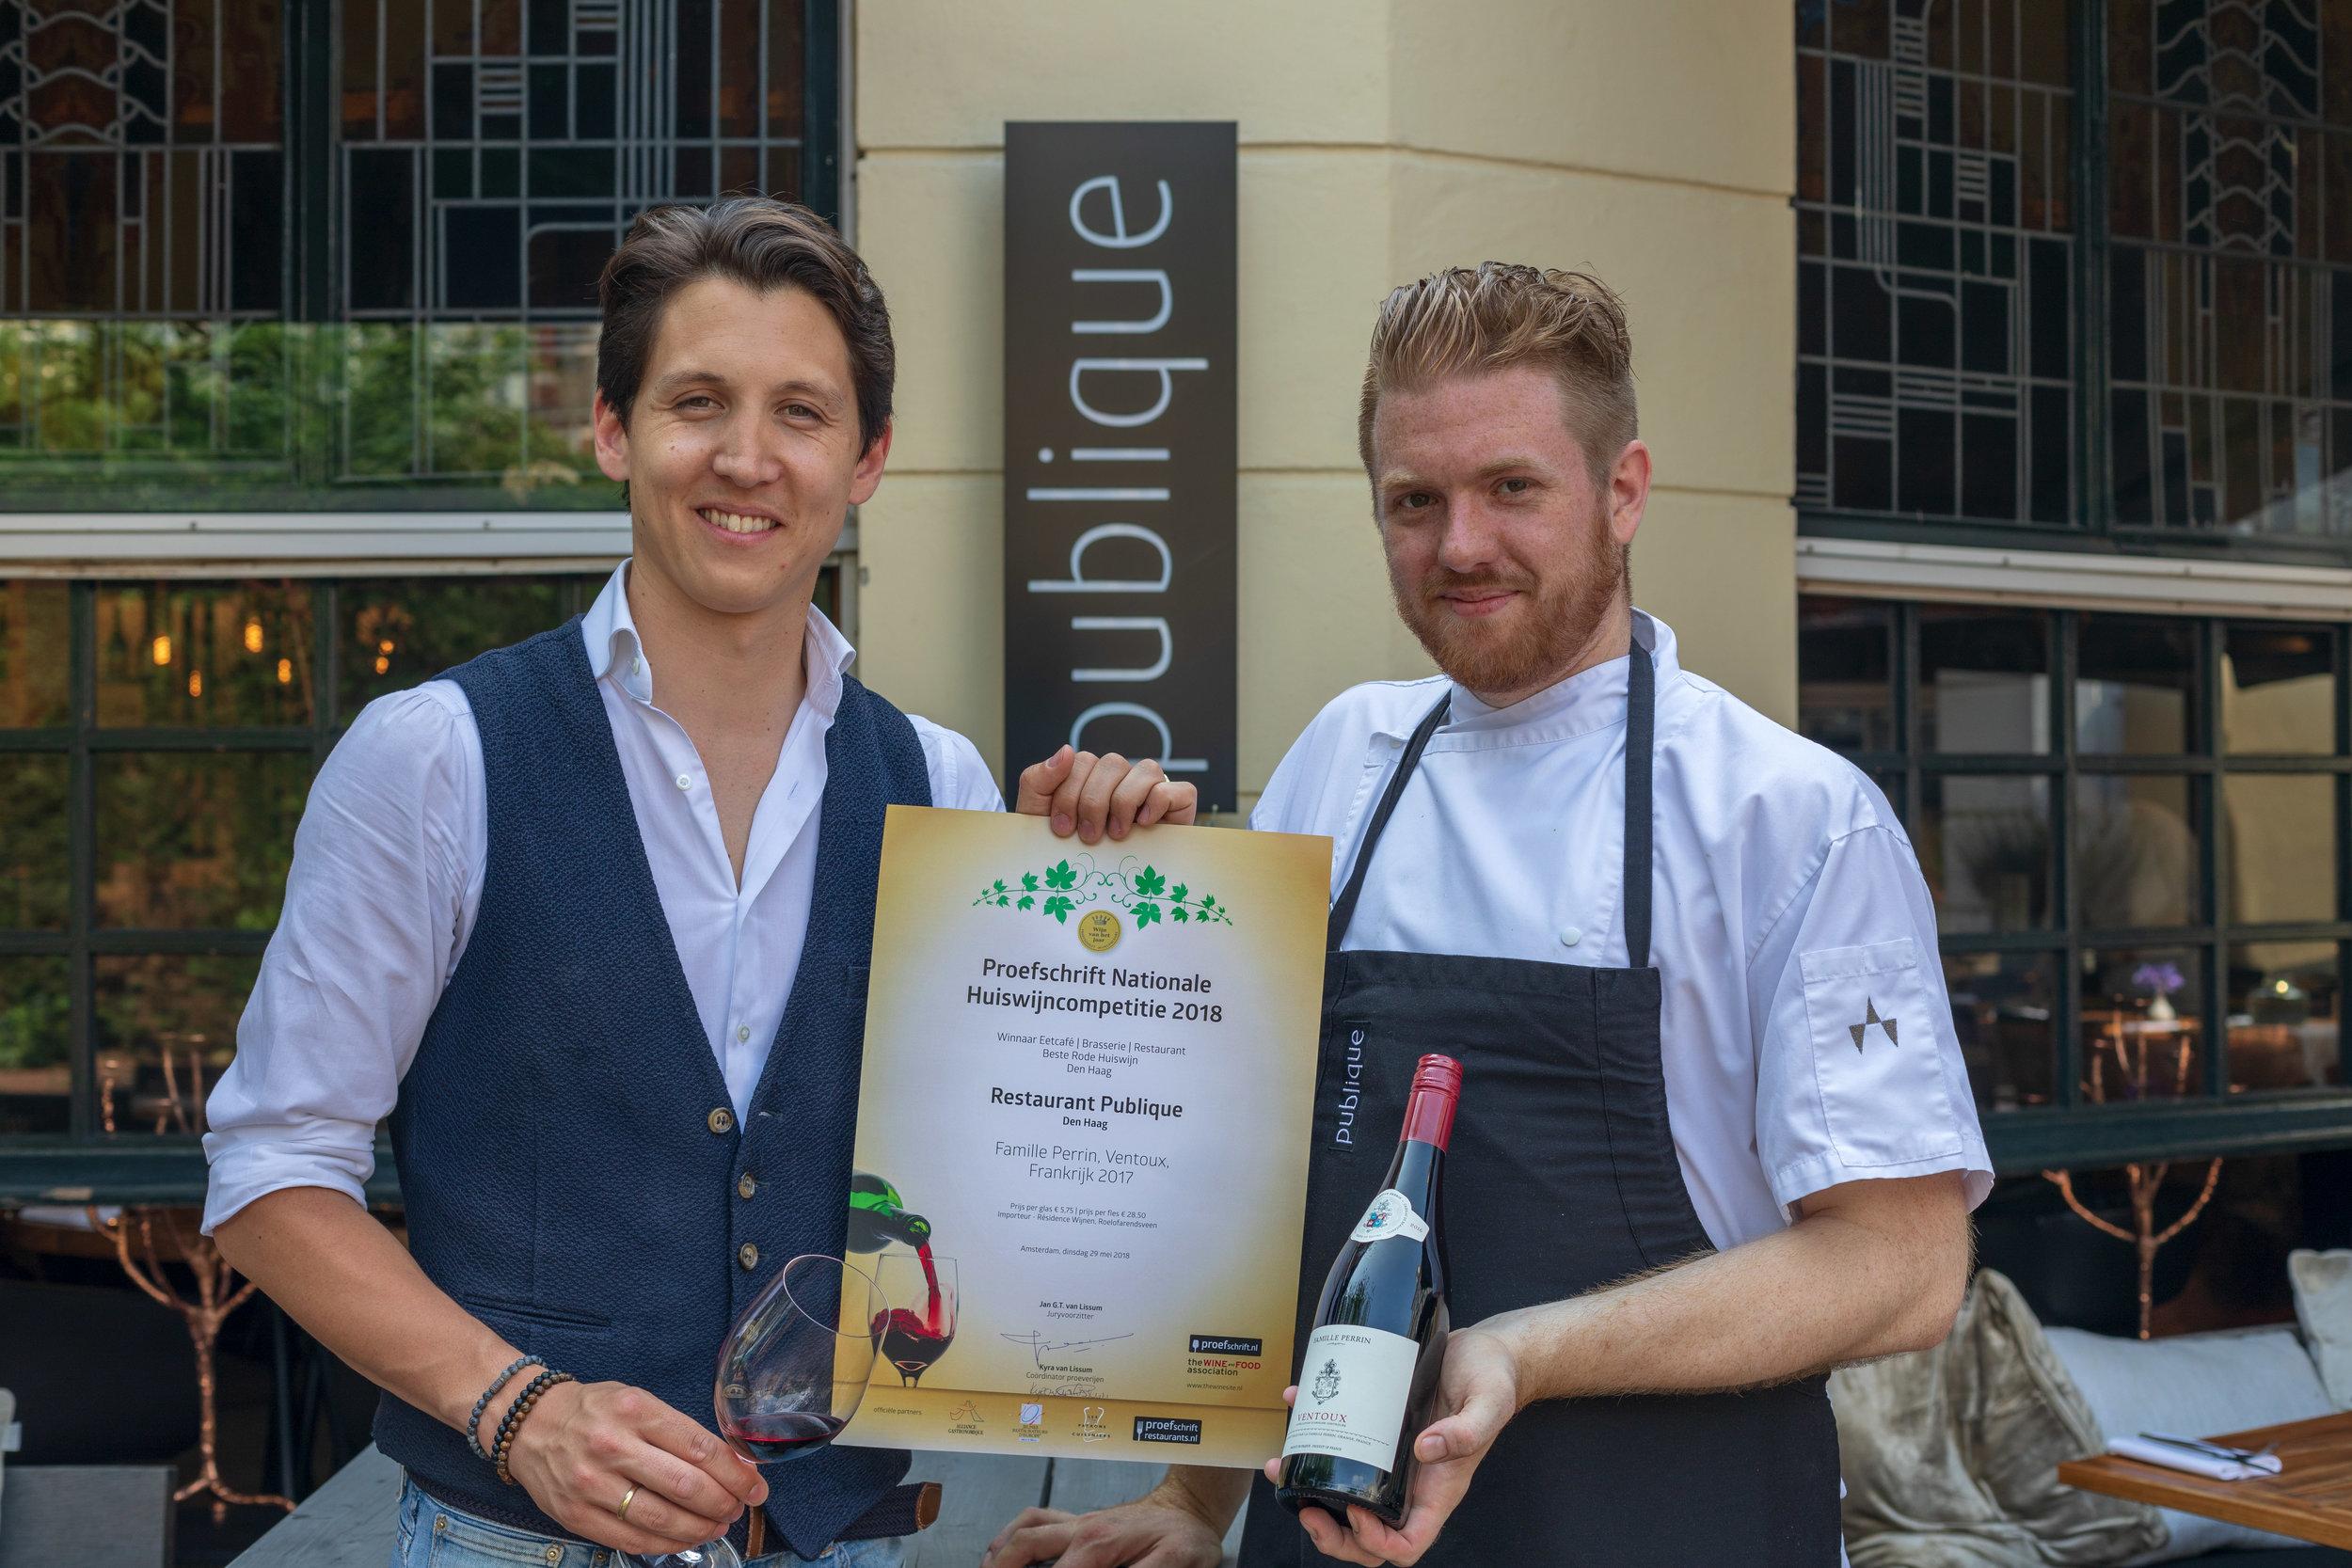 Maurits Jonkman & Mark van Bemmel Restaurant Publique